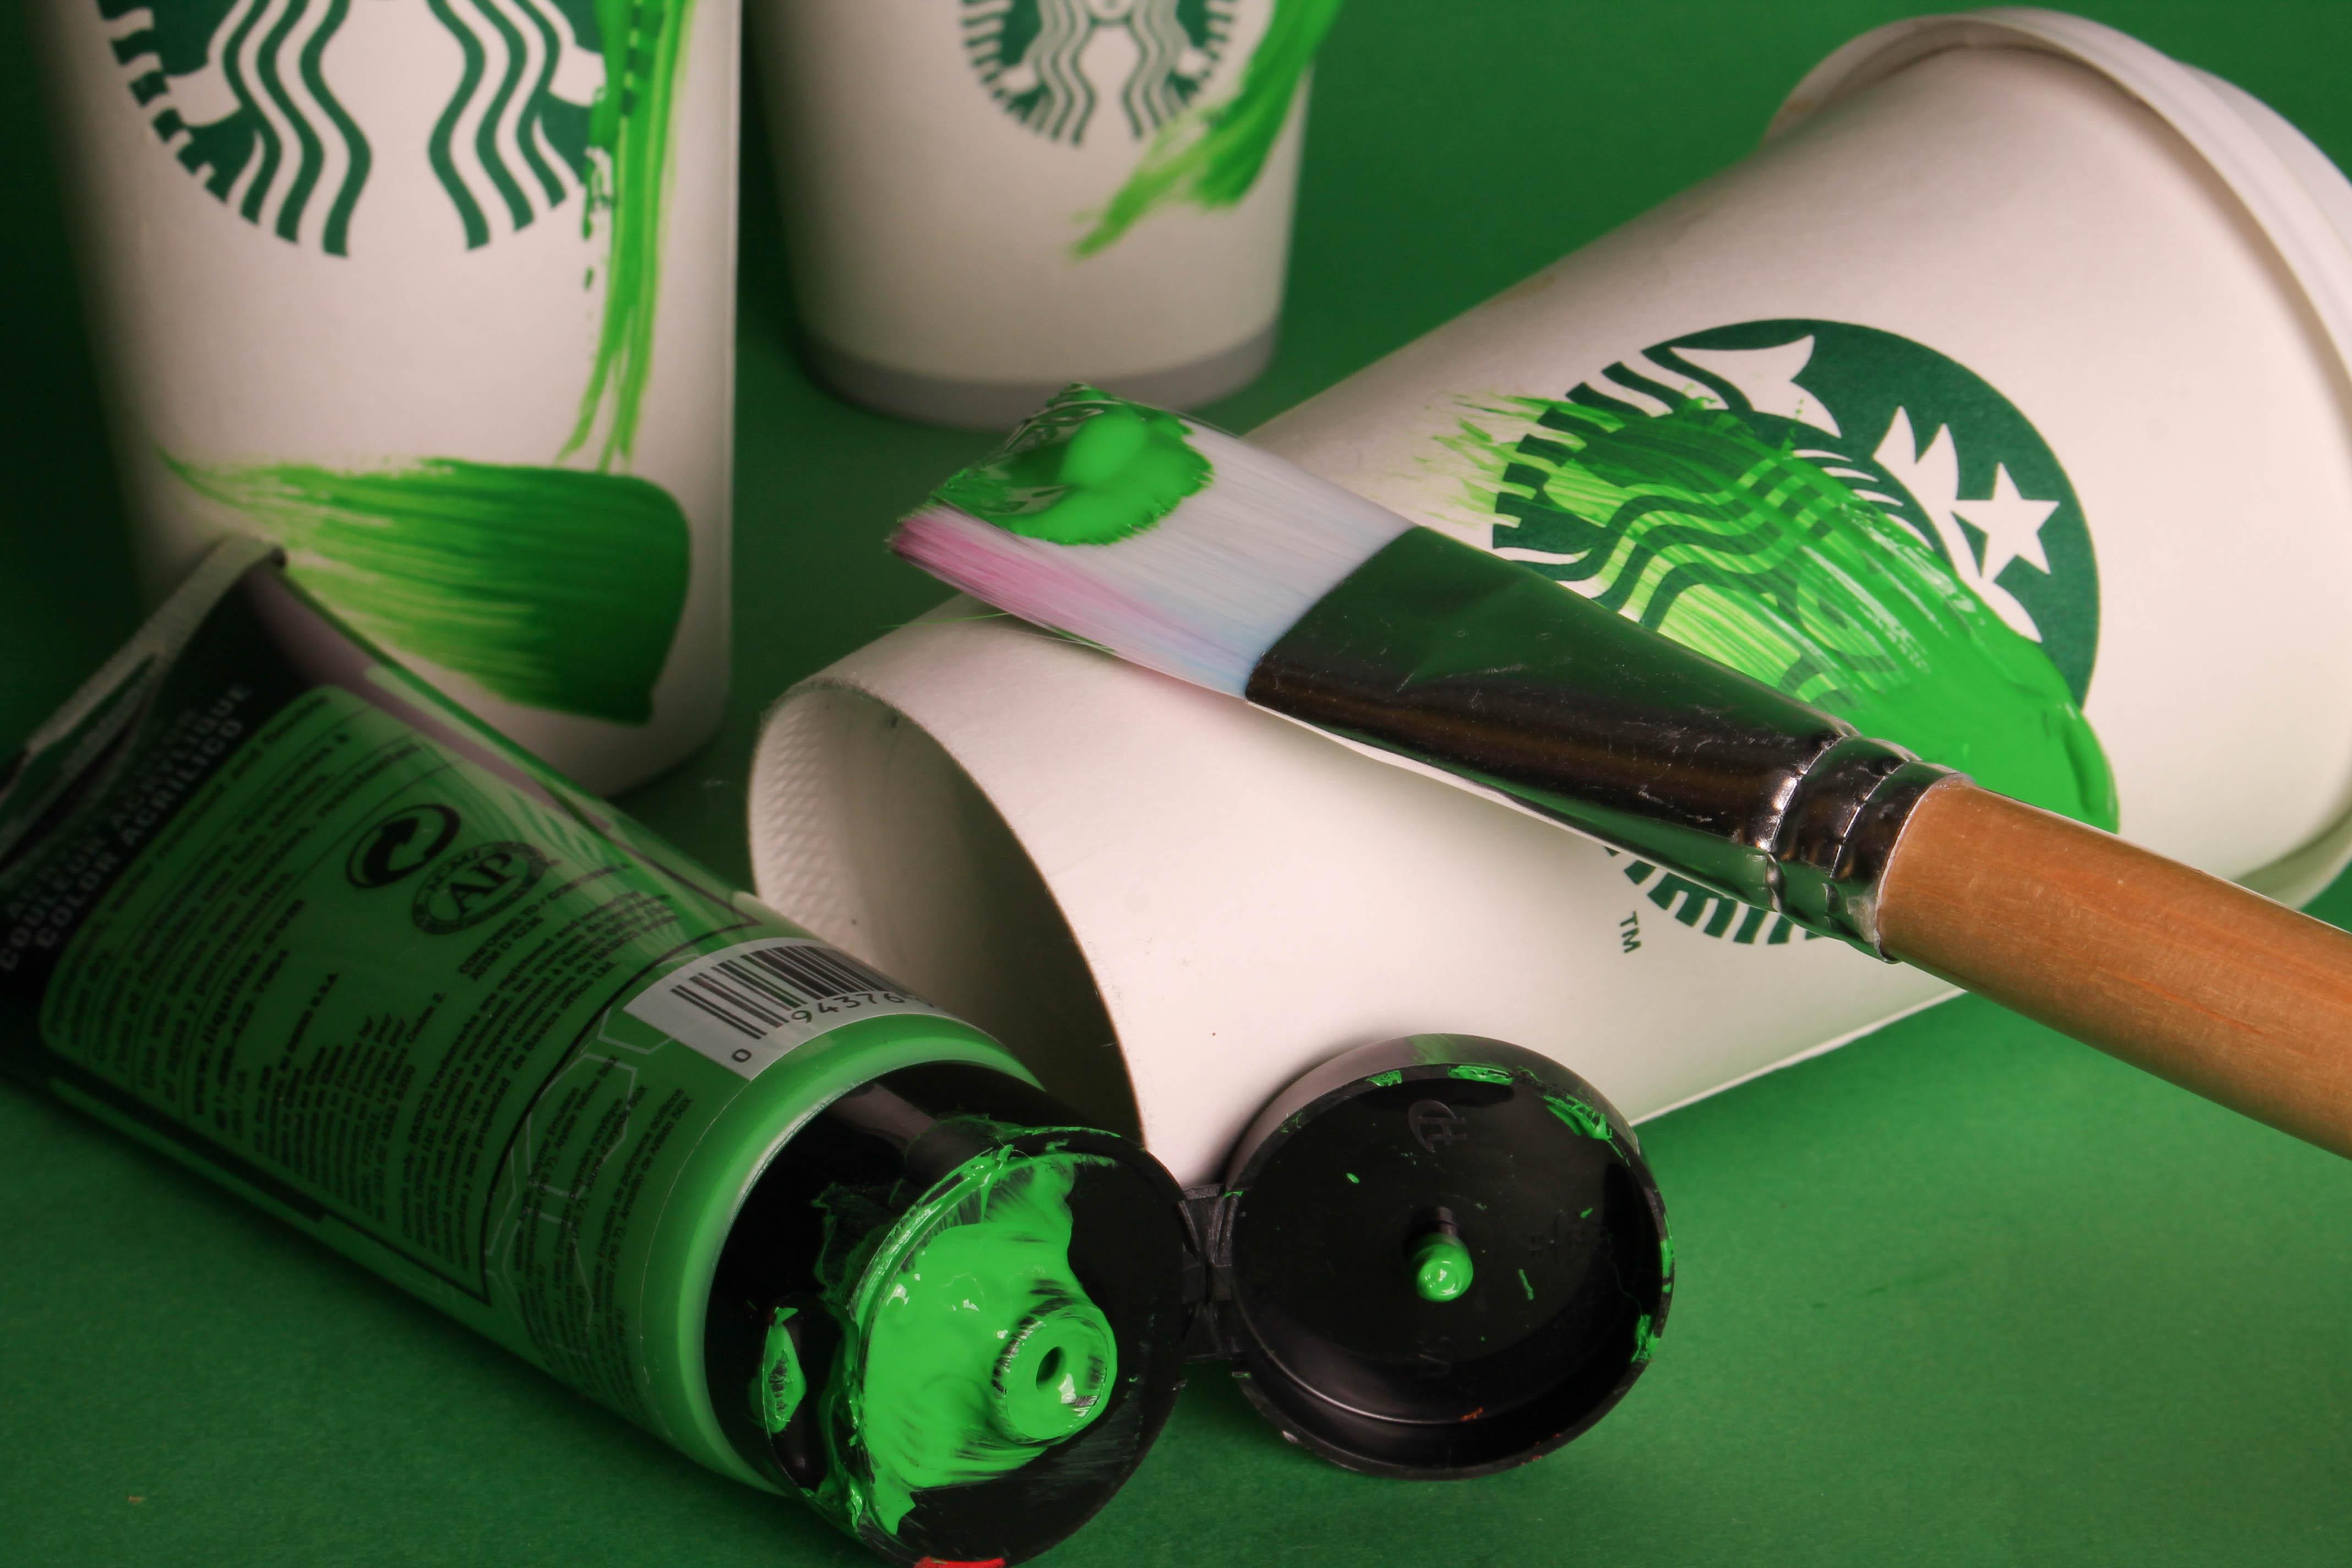 Starbucks Collection 17